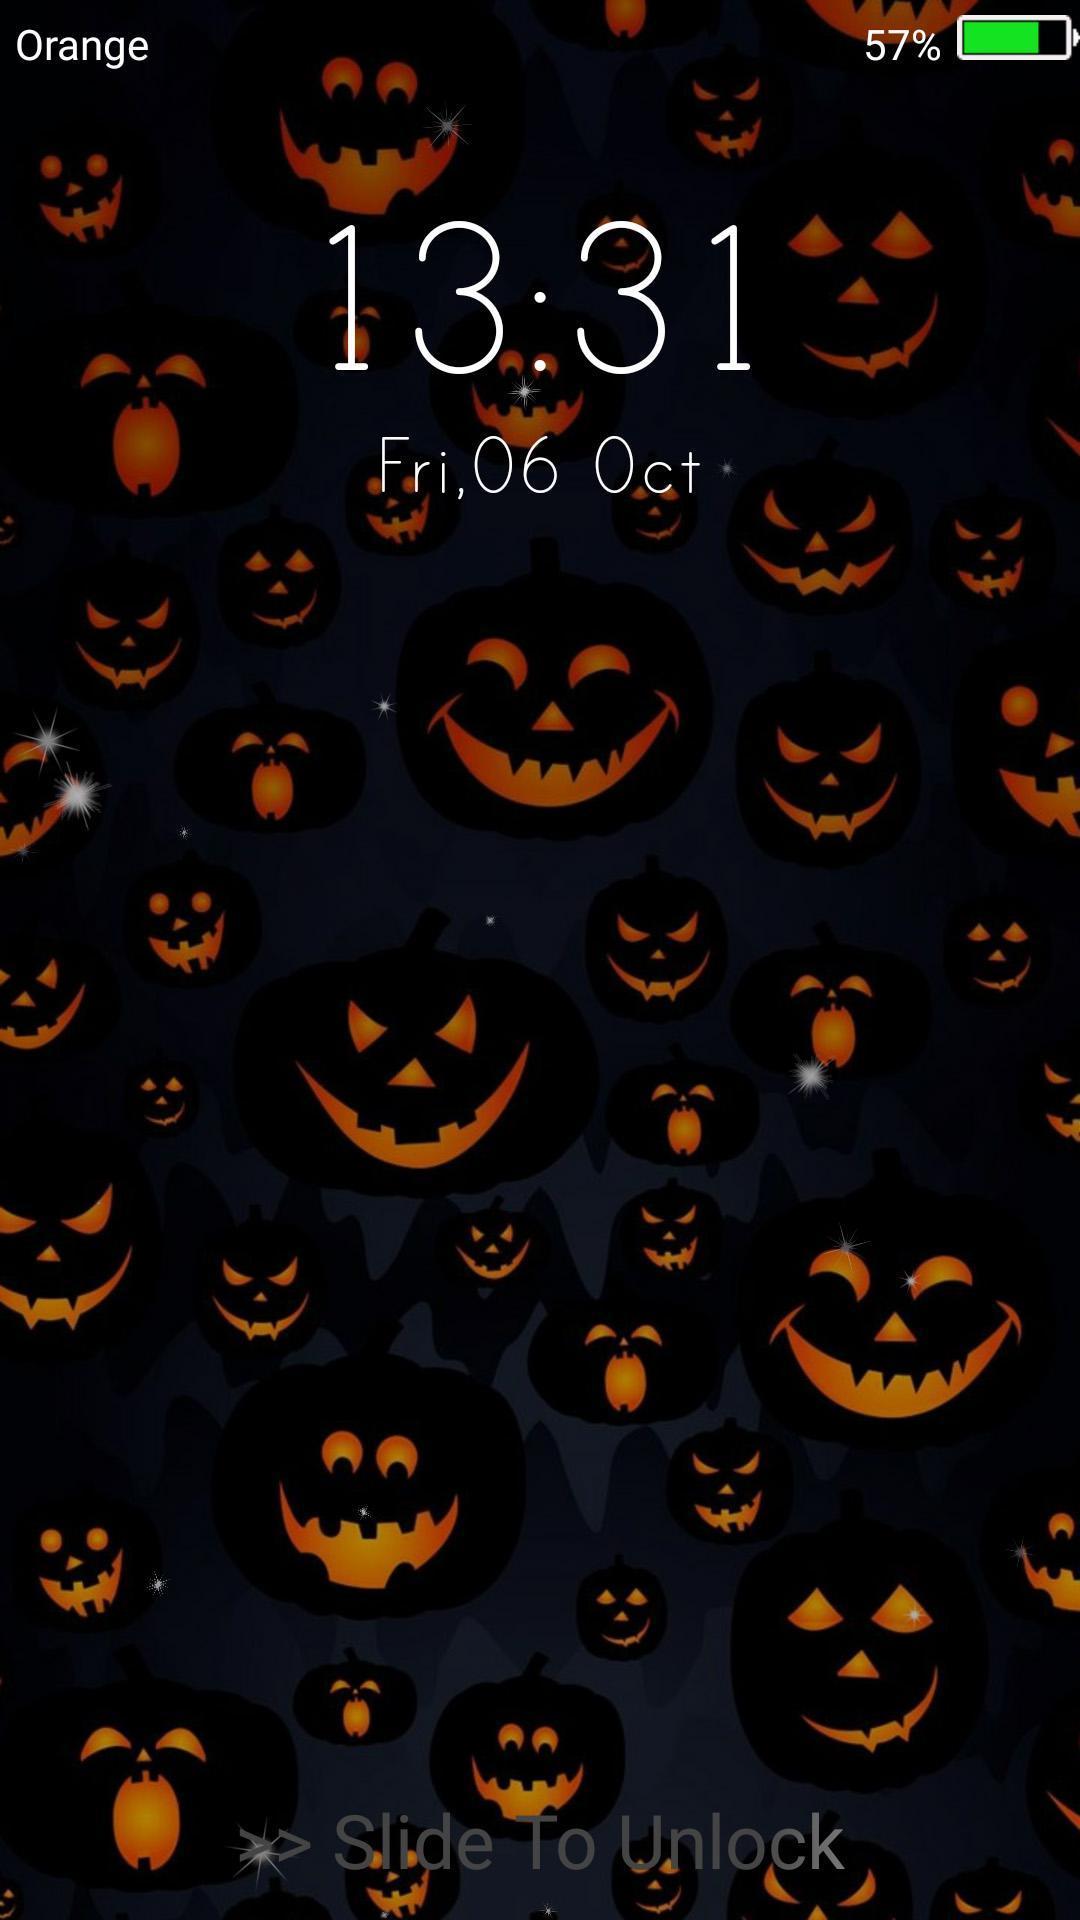 Halloween Live Wallpaper Lock Screen Dlya Android Skachat Apk